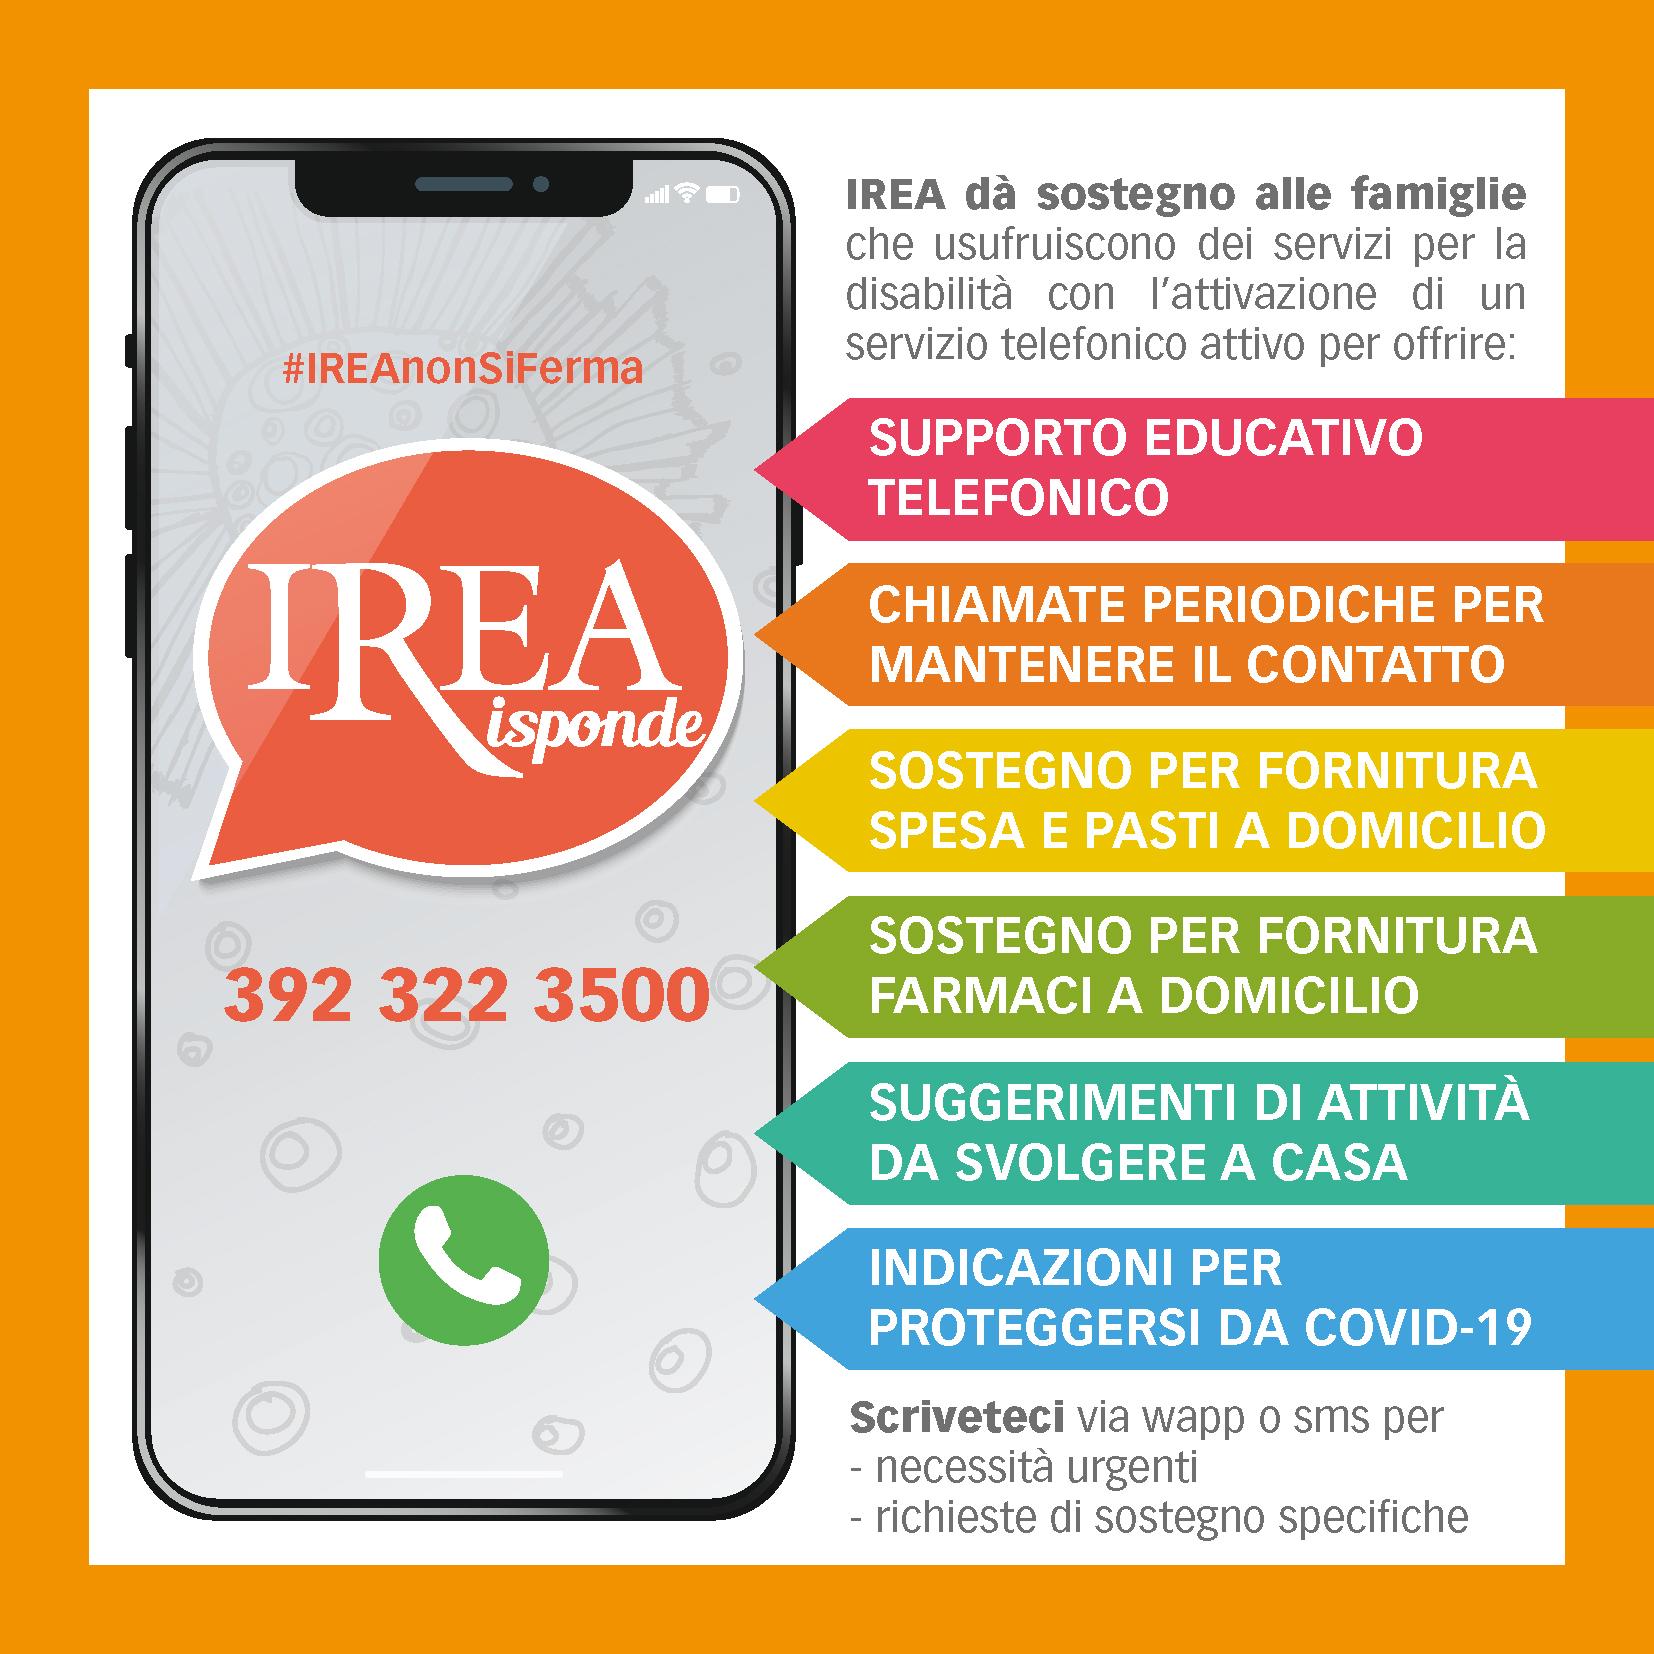 IREA Risponde numero utile